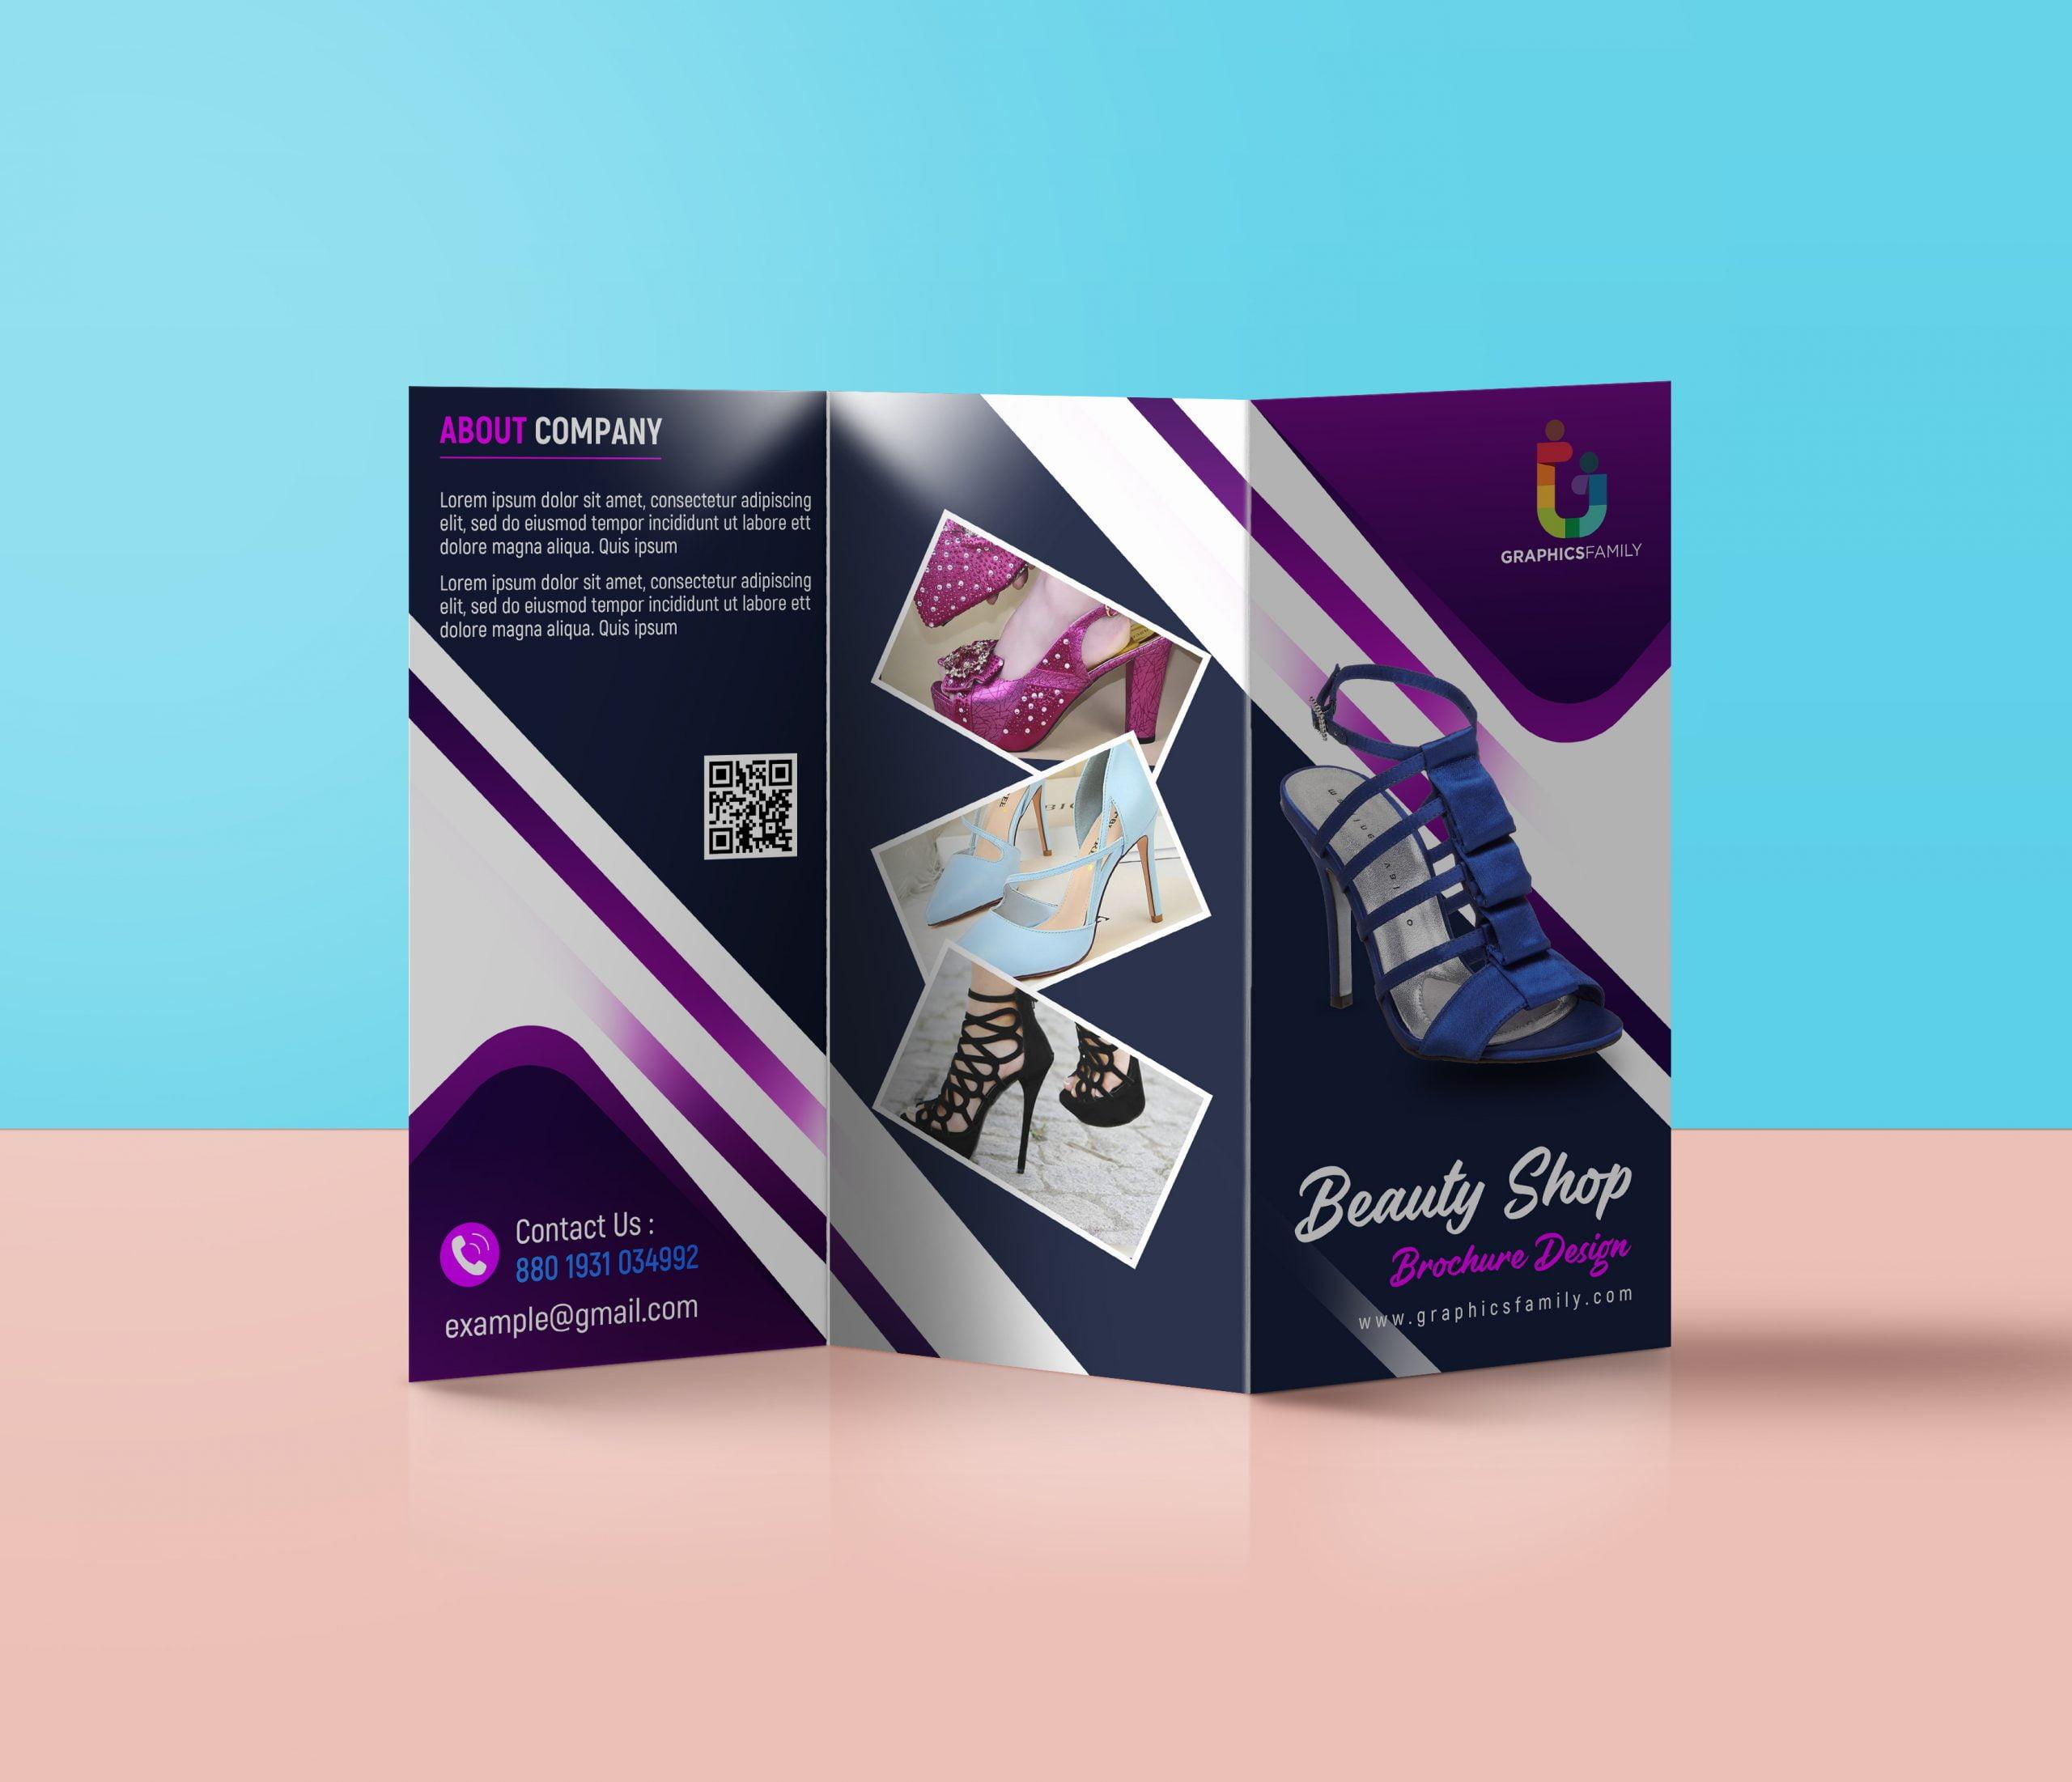 Free Photoshop Editable Trifold Brochure Design Download